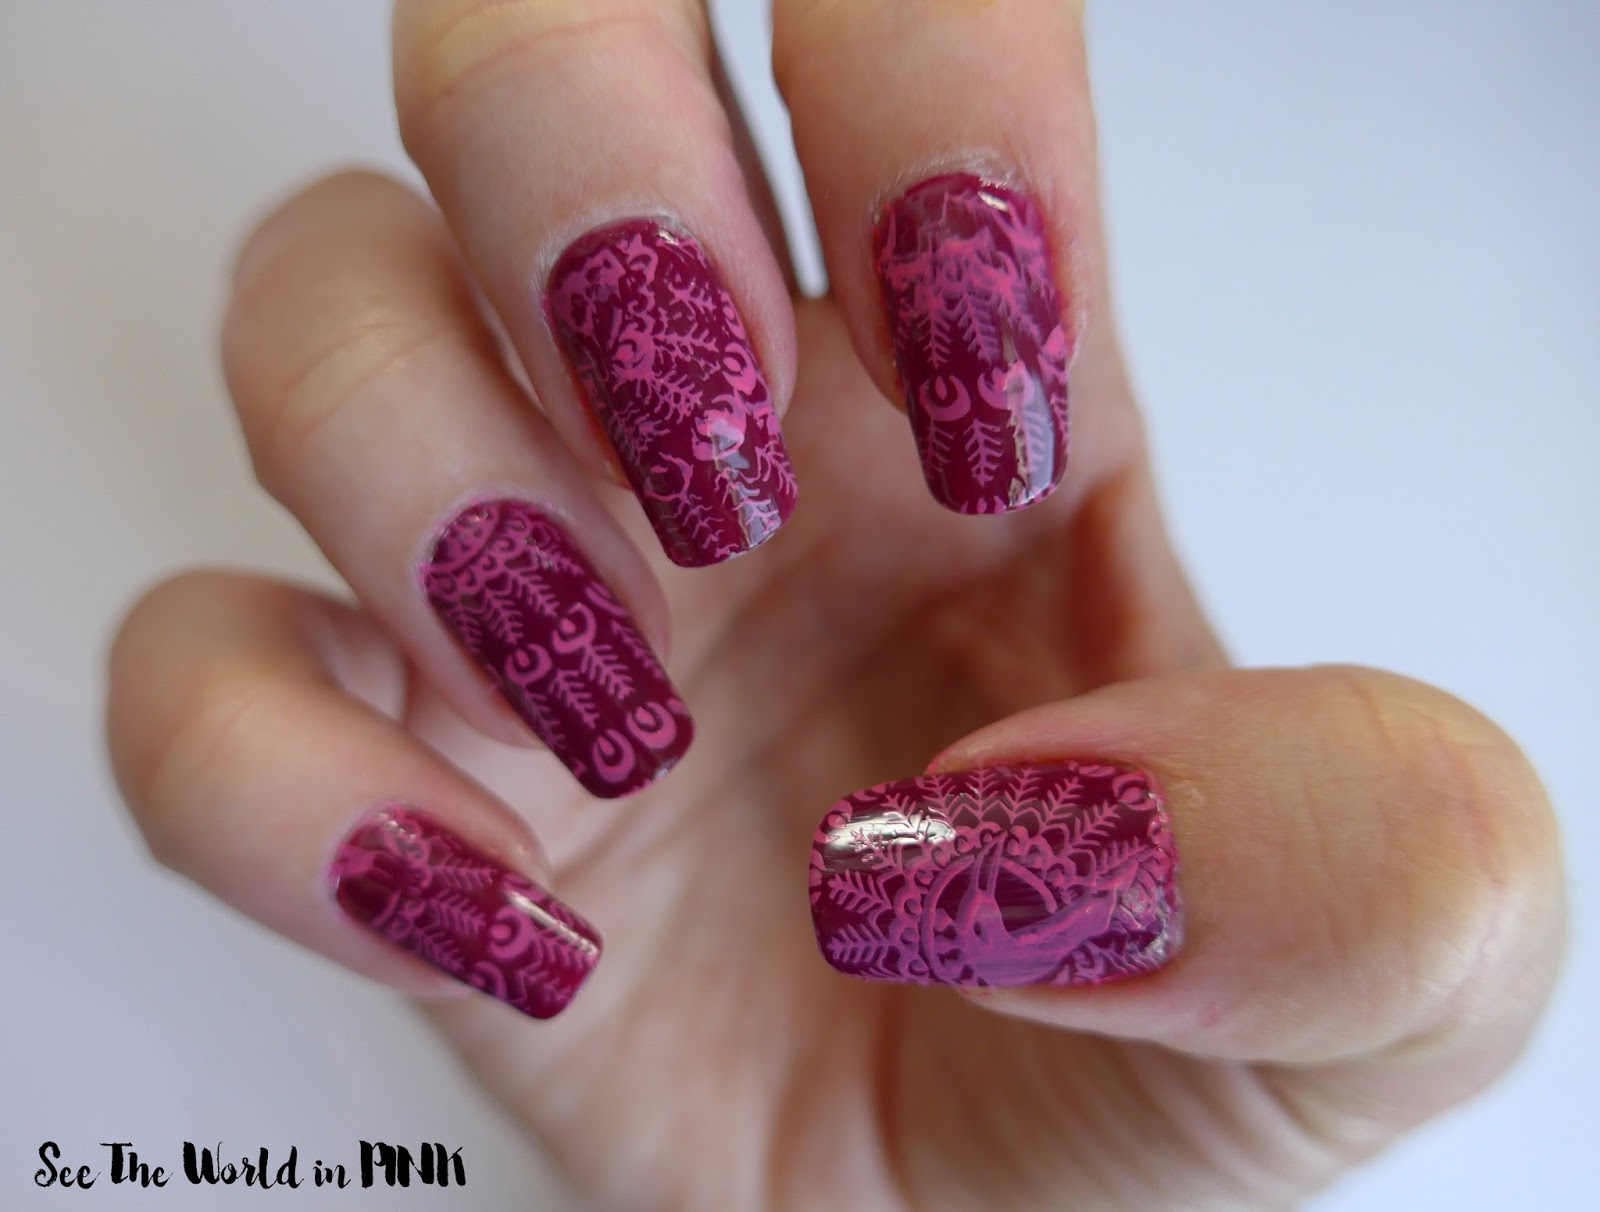 Manicure Monday - Essie Gel Couture in \